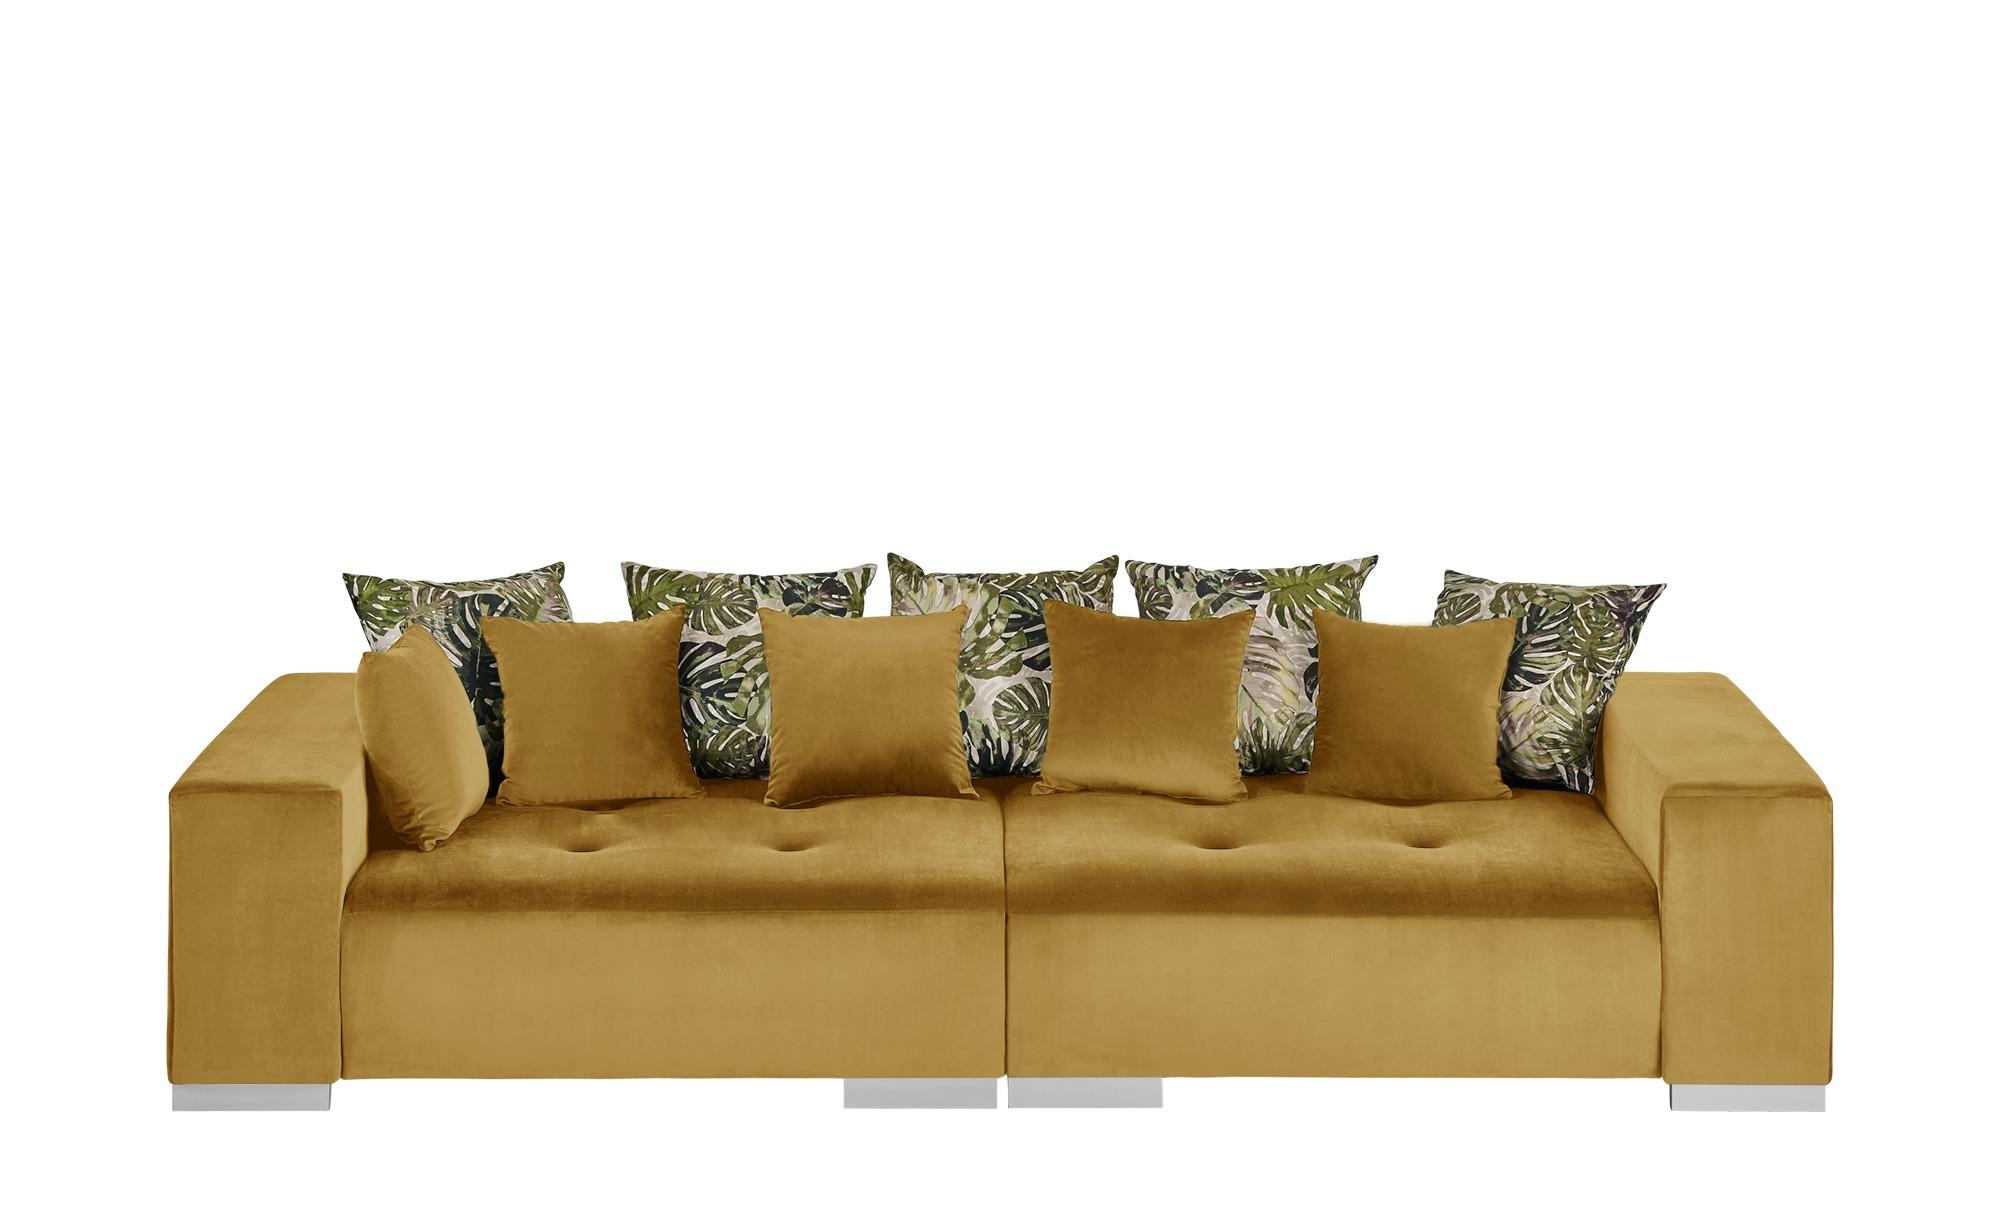 switch Big Sofa gold-gelb - Mikrofaser Kim ¦ gelb ¦ Maße (cm): B: 300 H: 85 T: 136 Polstermöbel > Sofas > Big-Sofas - Höffner